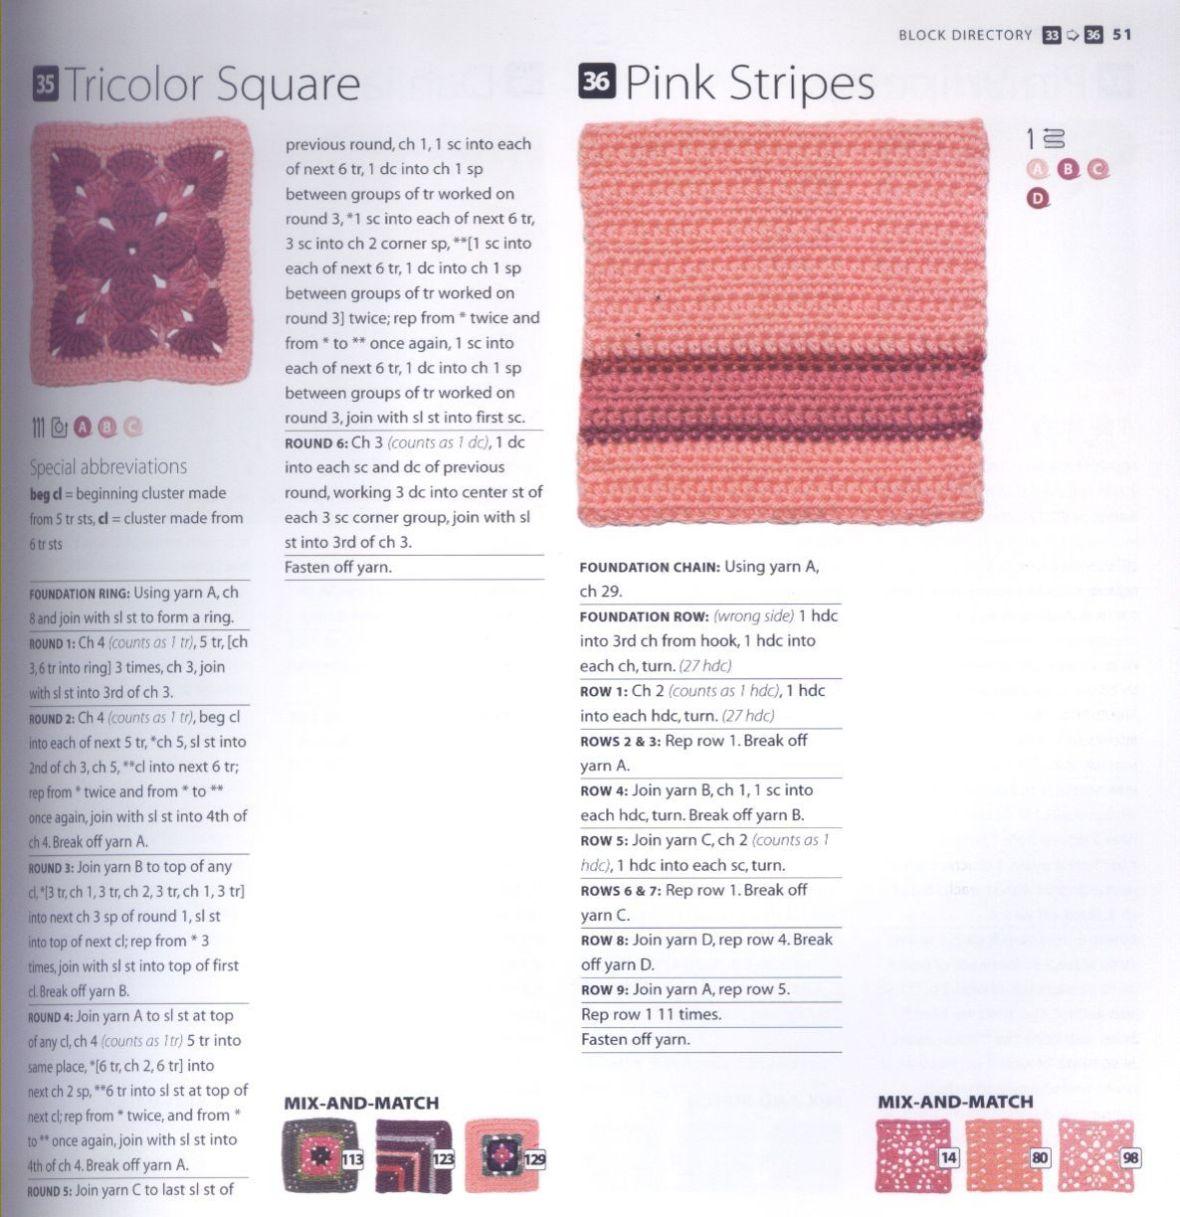 200 Crocheted Blocks for blankets, throws & Afghans 051